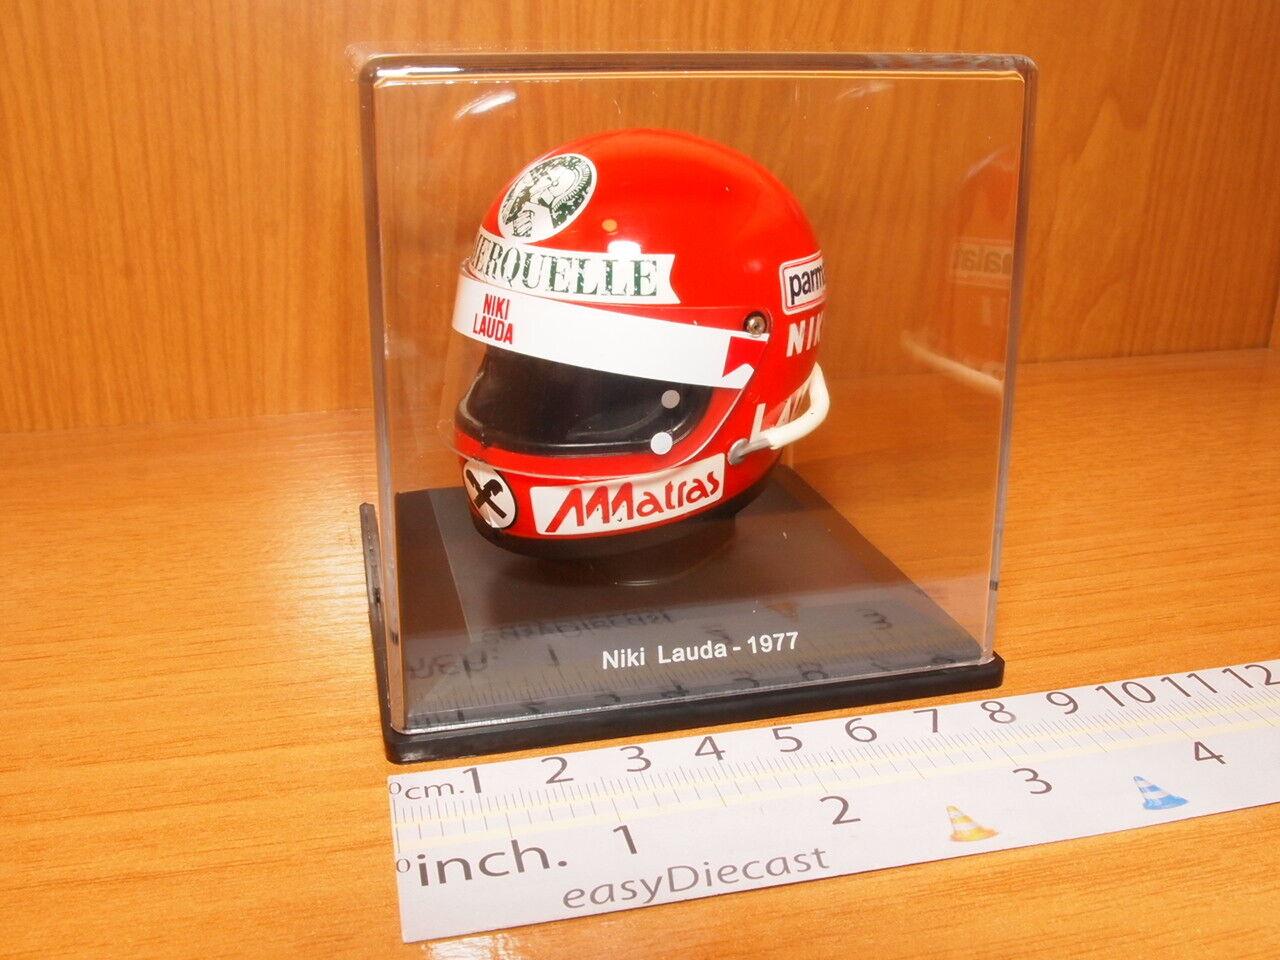 Niki Lauda 1977 Casque 1 5 F1 Parmalat Helmet Casco Formula 1 romerquelle